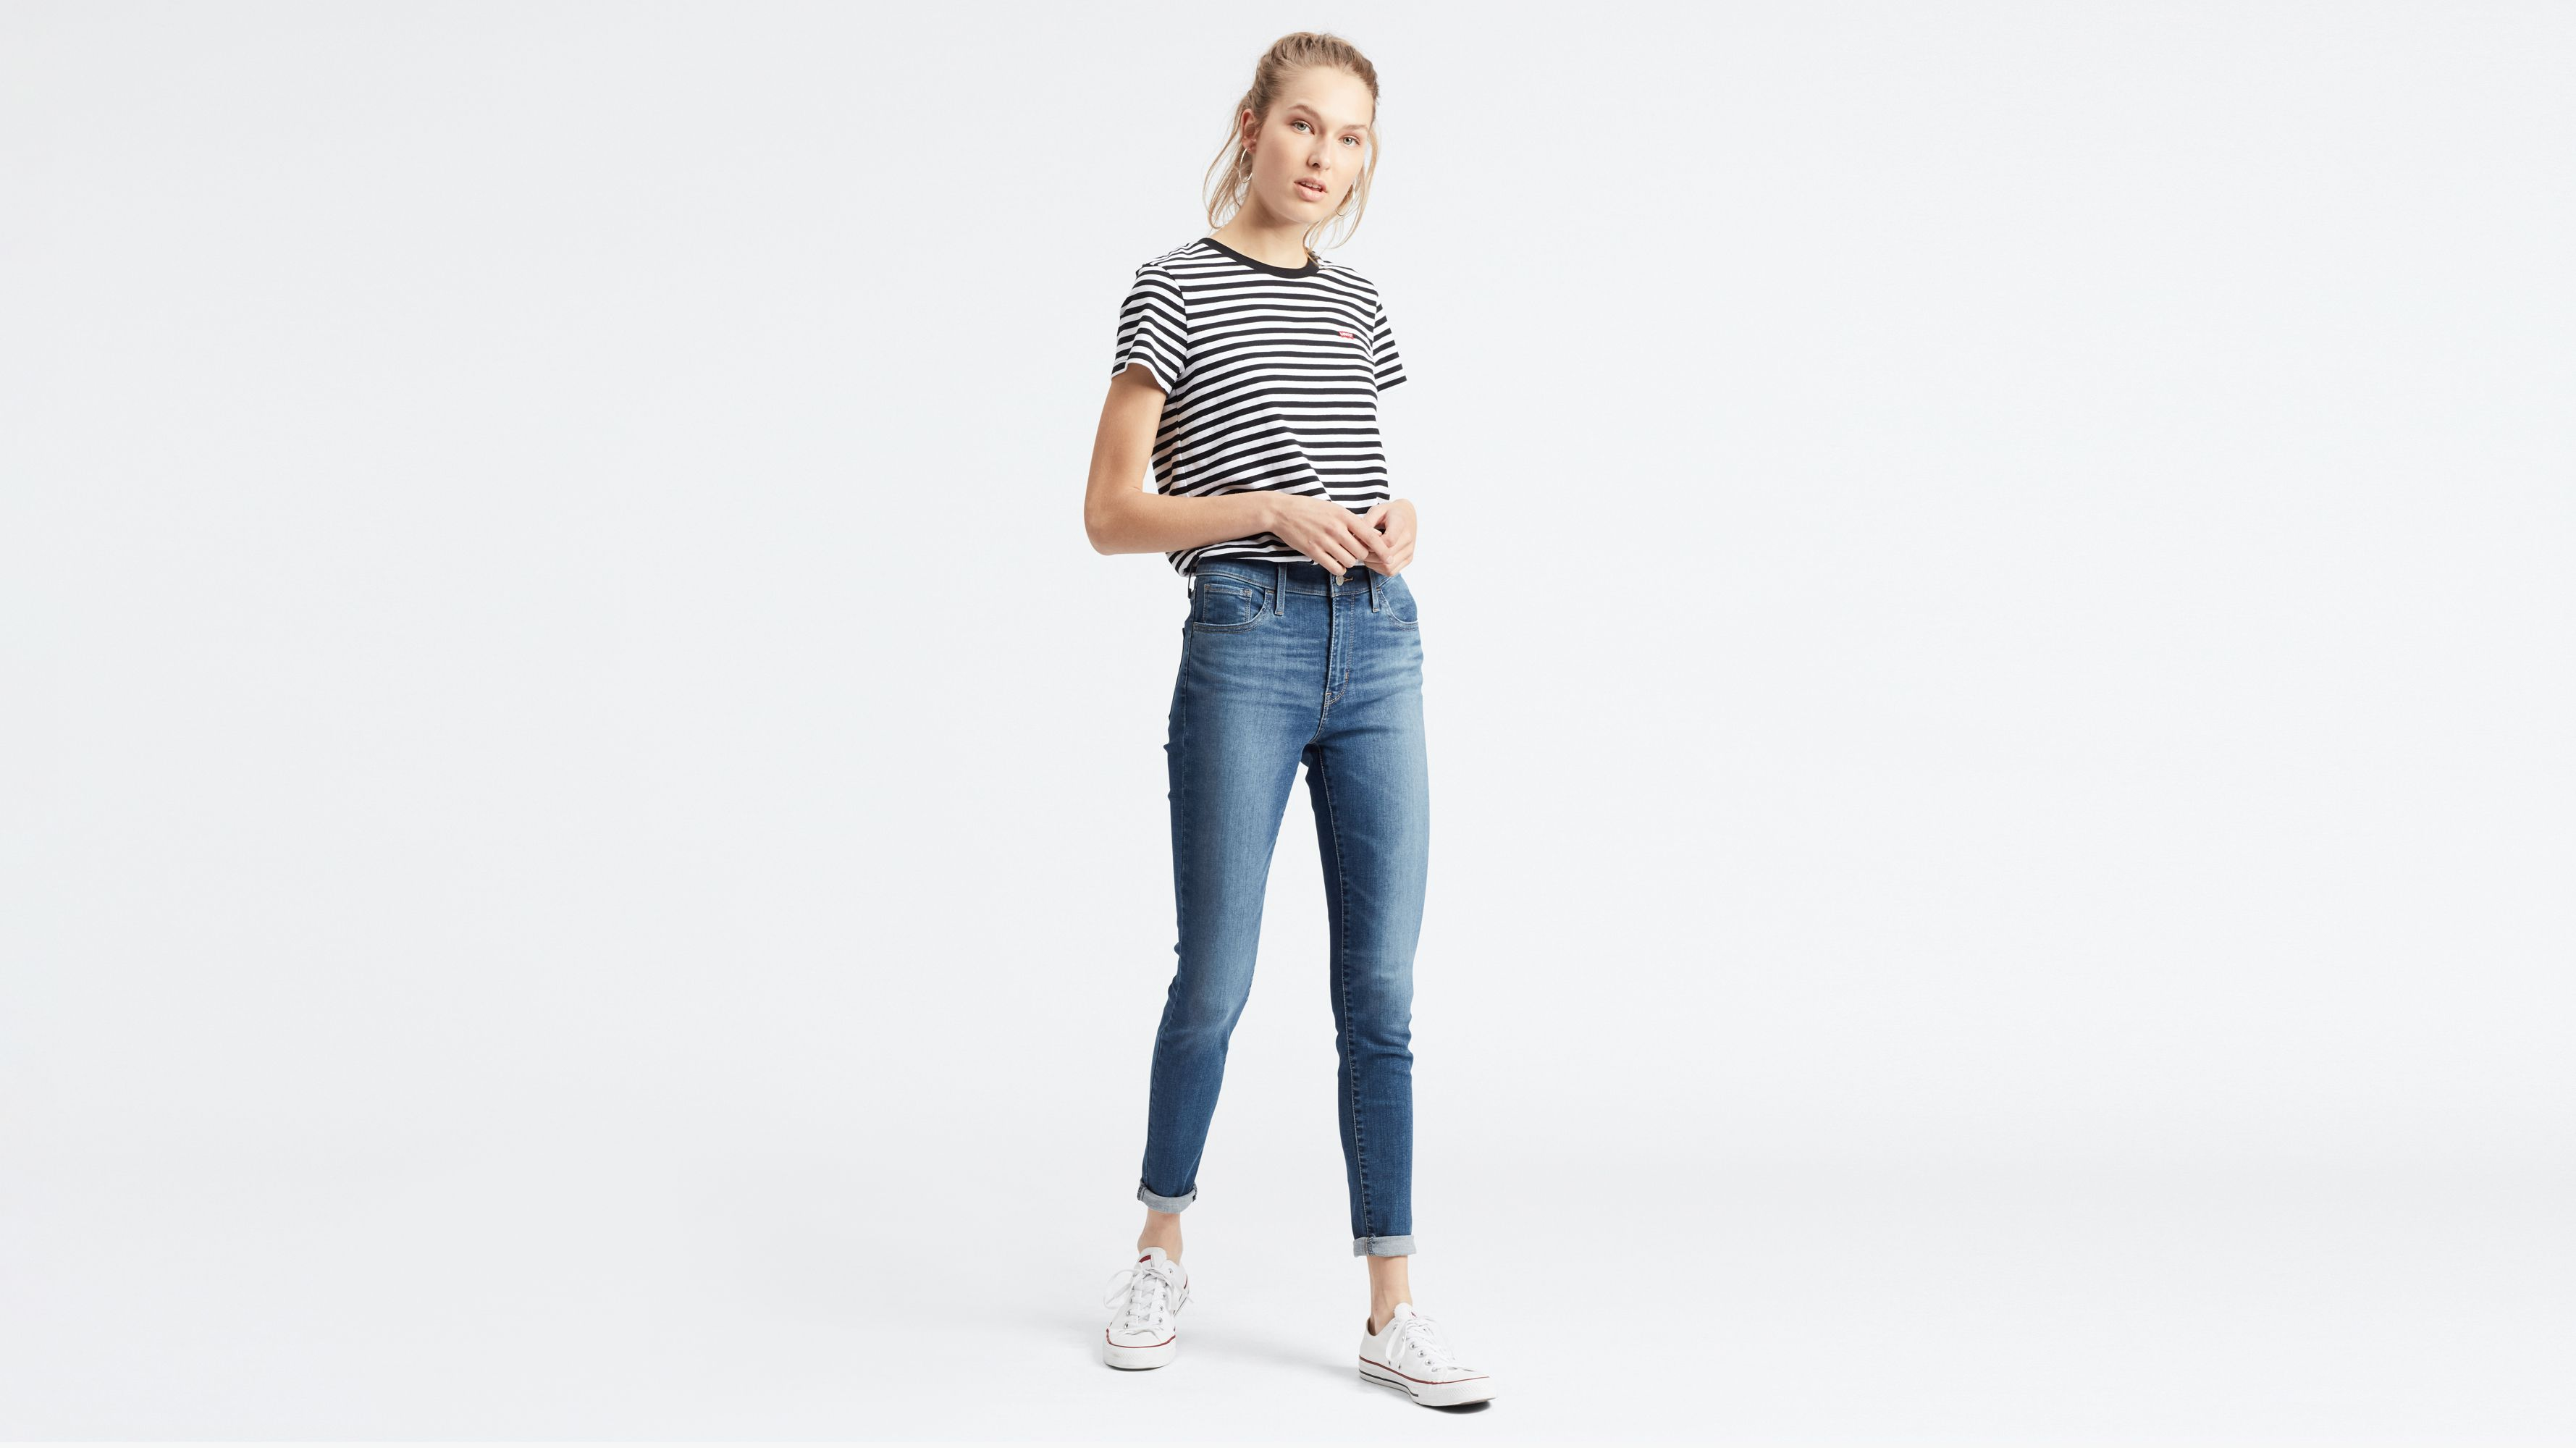 720™ High Waisted Super Skinny Jeans